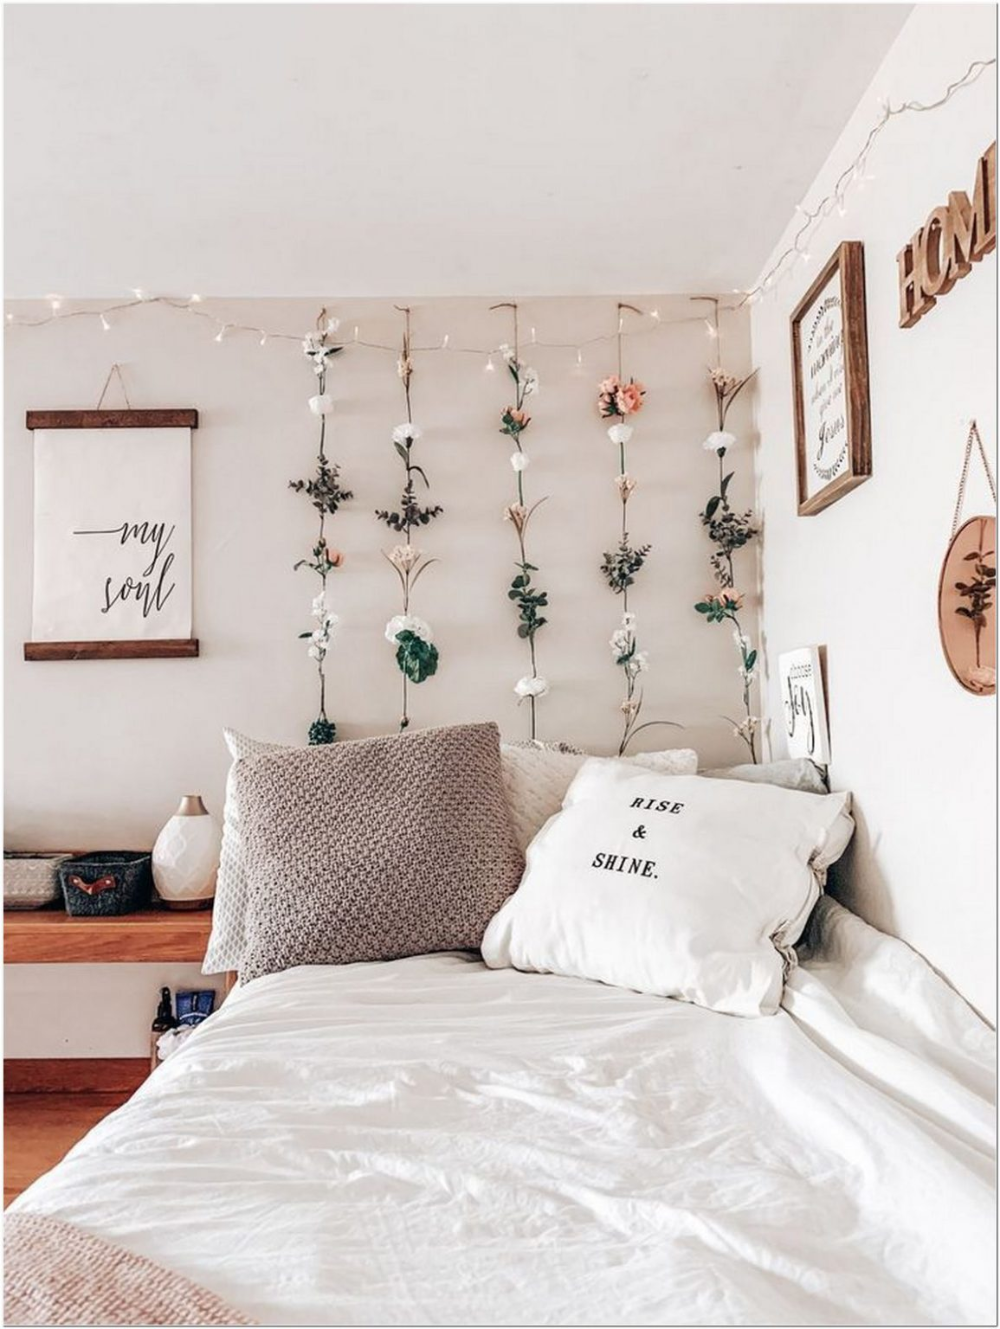 93 Vsco Room Ideas How To Create A Cute Vsco Room 16 In 2020 College Dorm Room Decor Dorm Room Decor Dorm Room Designs